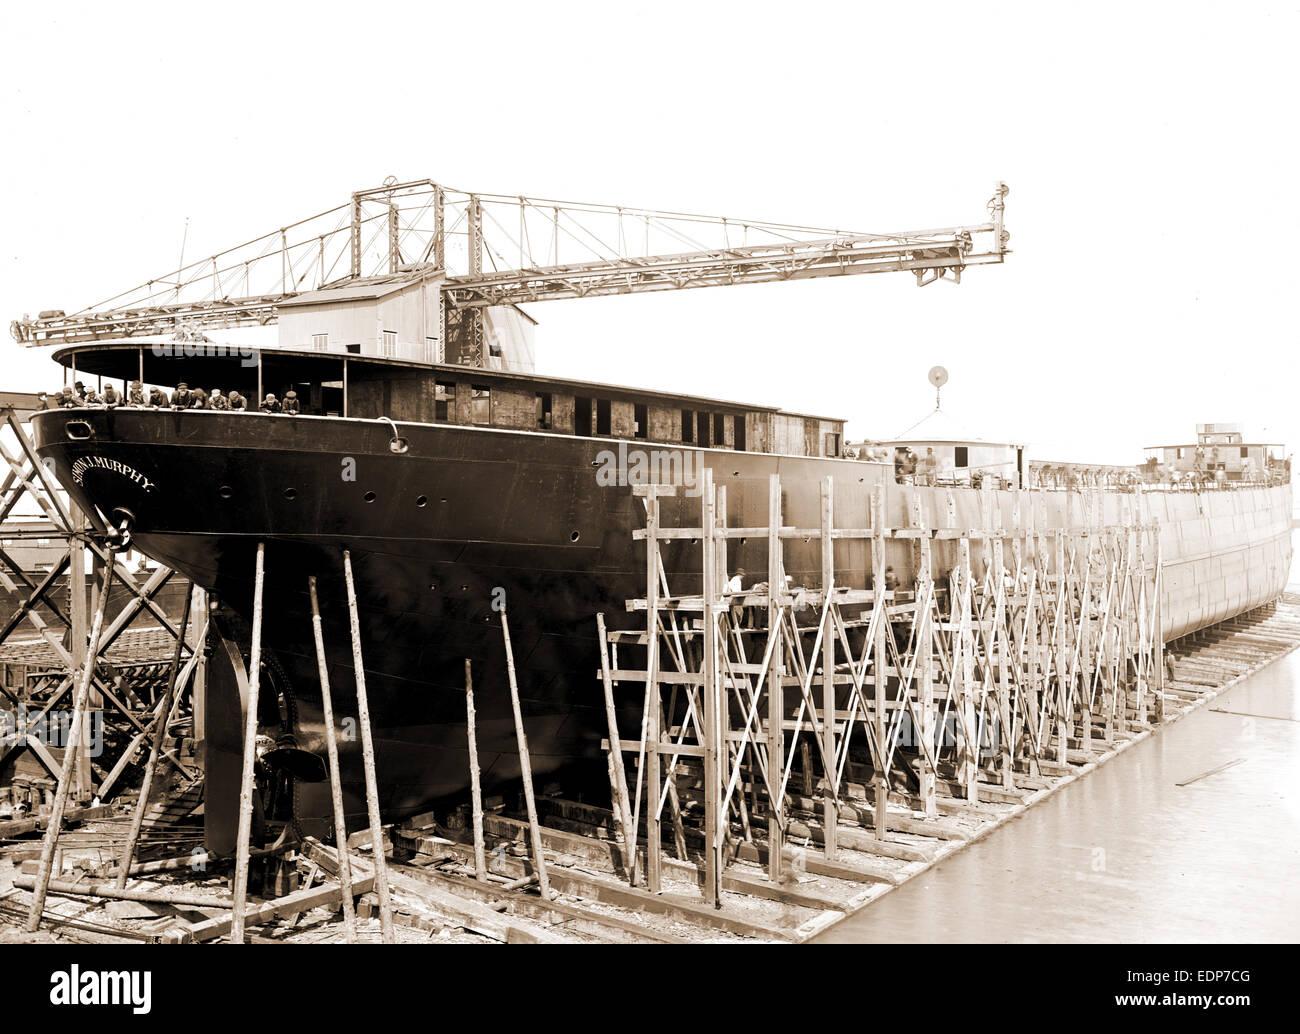 Str. Simon J. Murphy on the ways, Simon J. Murphy (Steamship), Ships, Boat & ship industry, United States, Michigan, - Stock Image